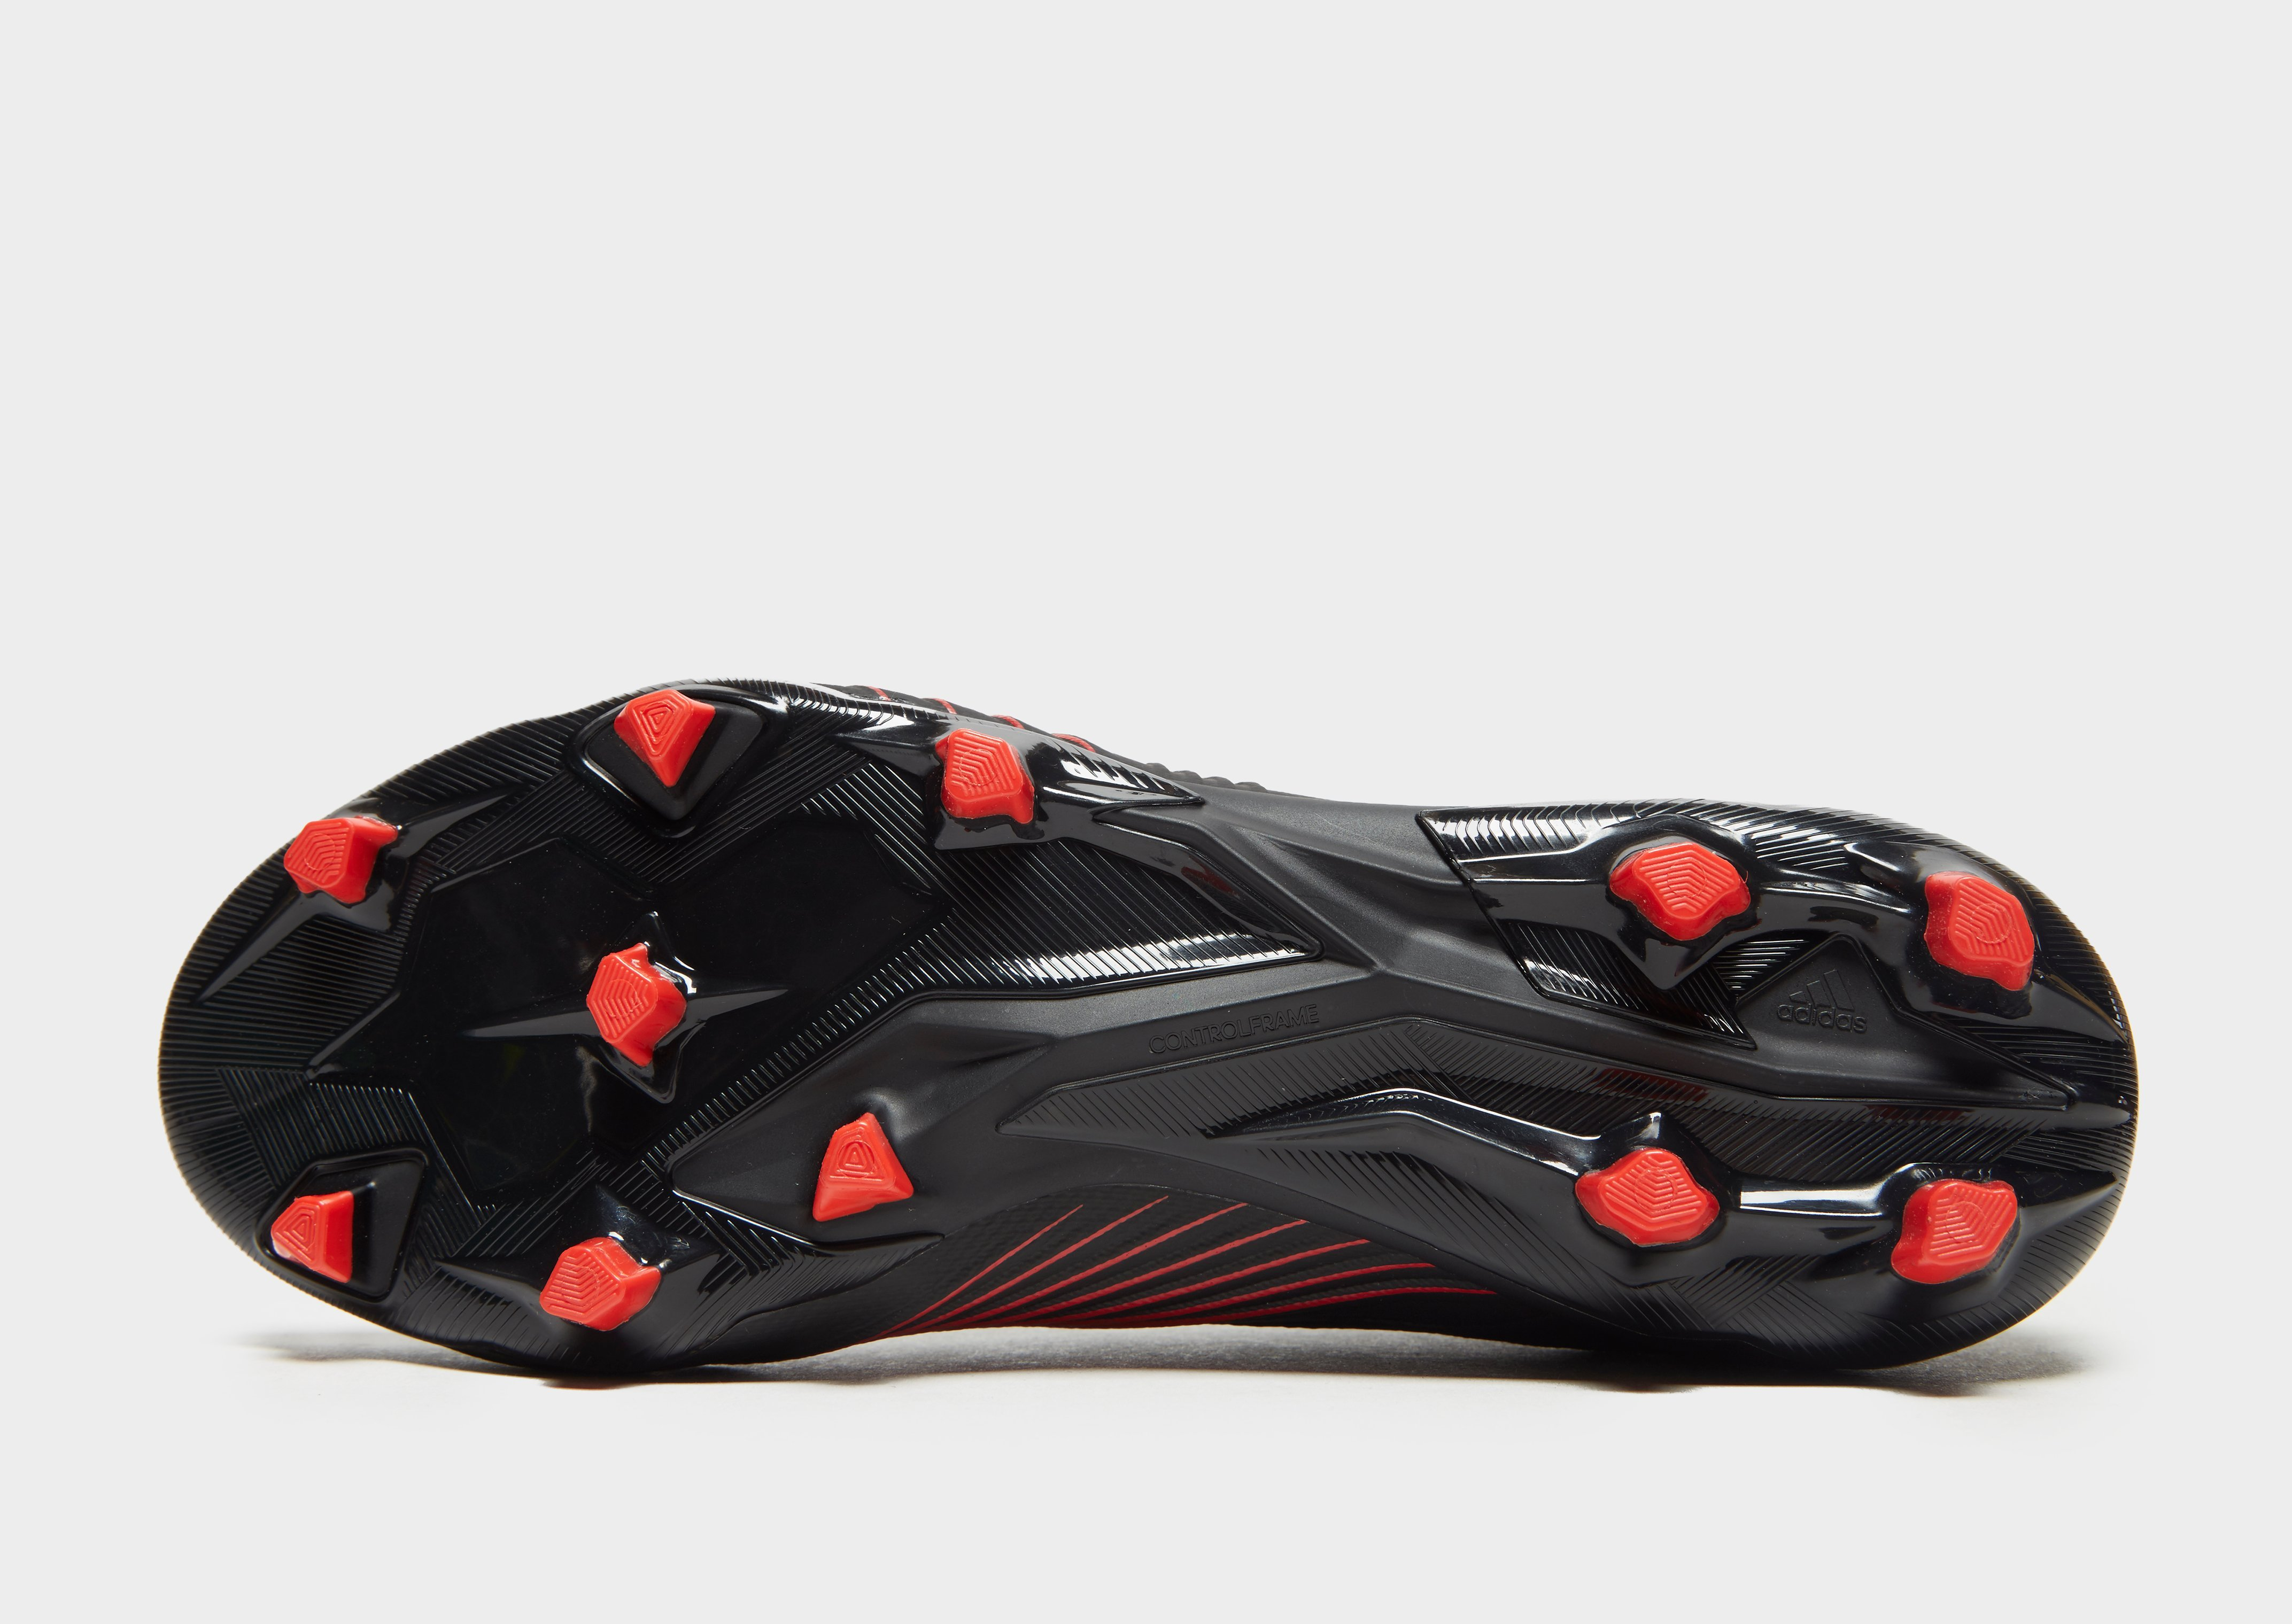 adidas Archetic Predator 19.1 FG